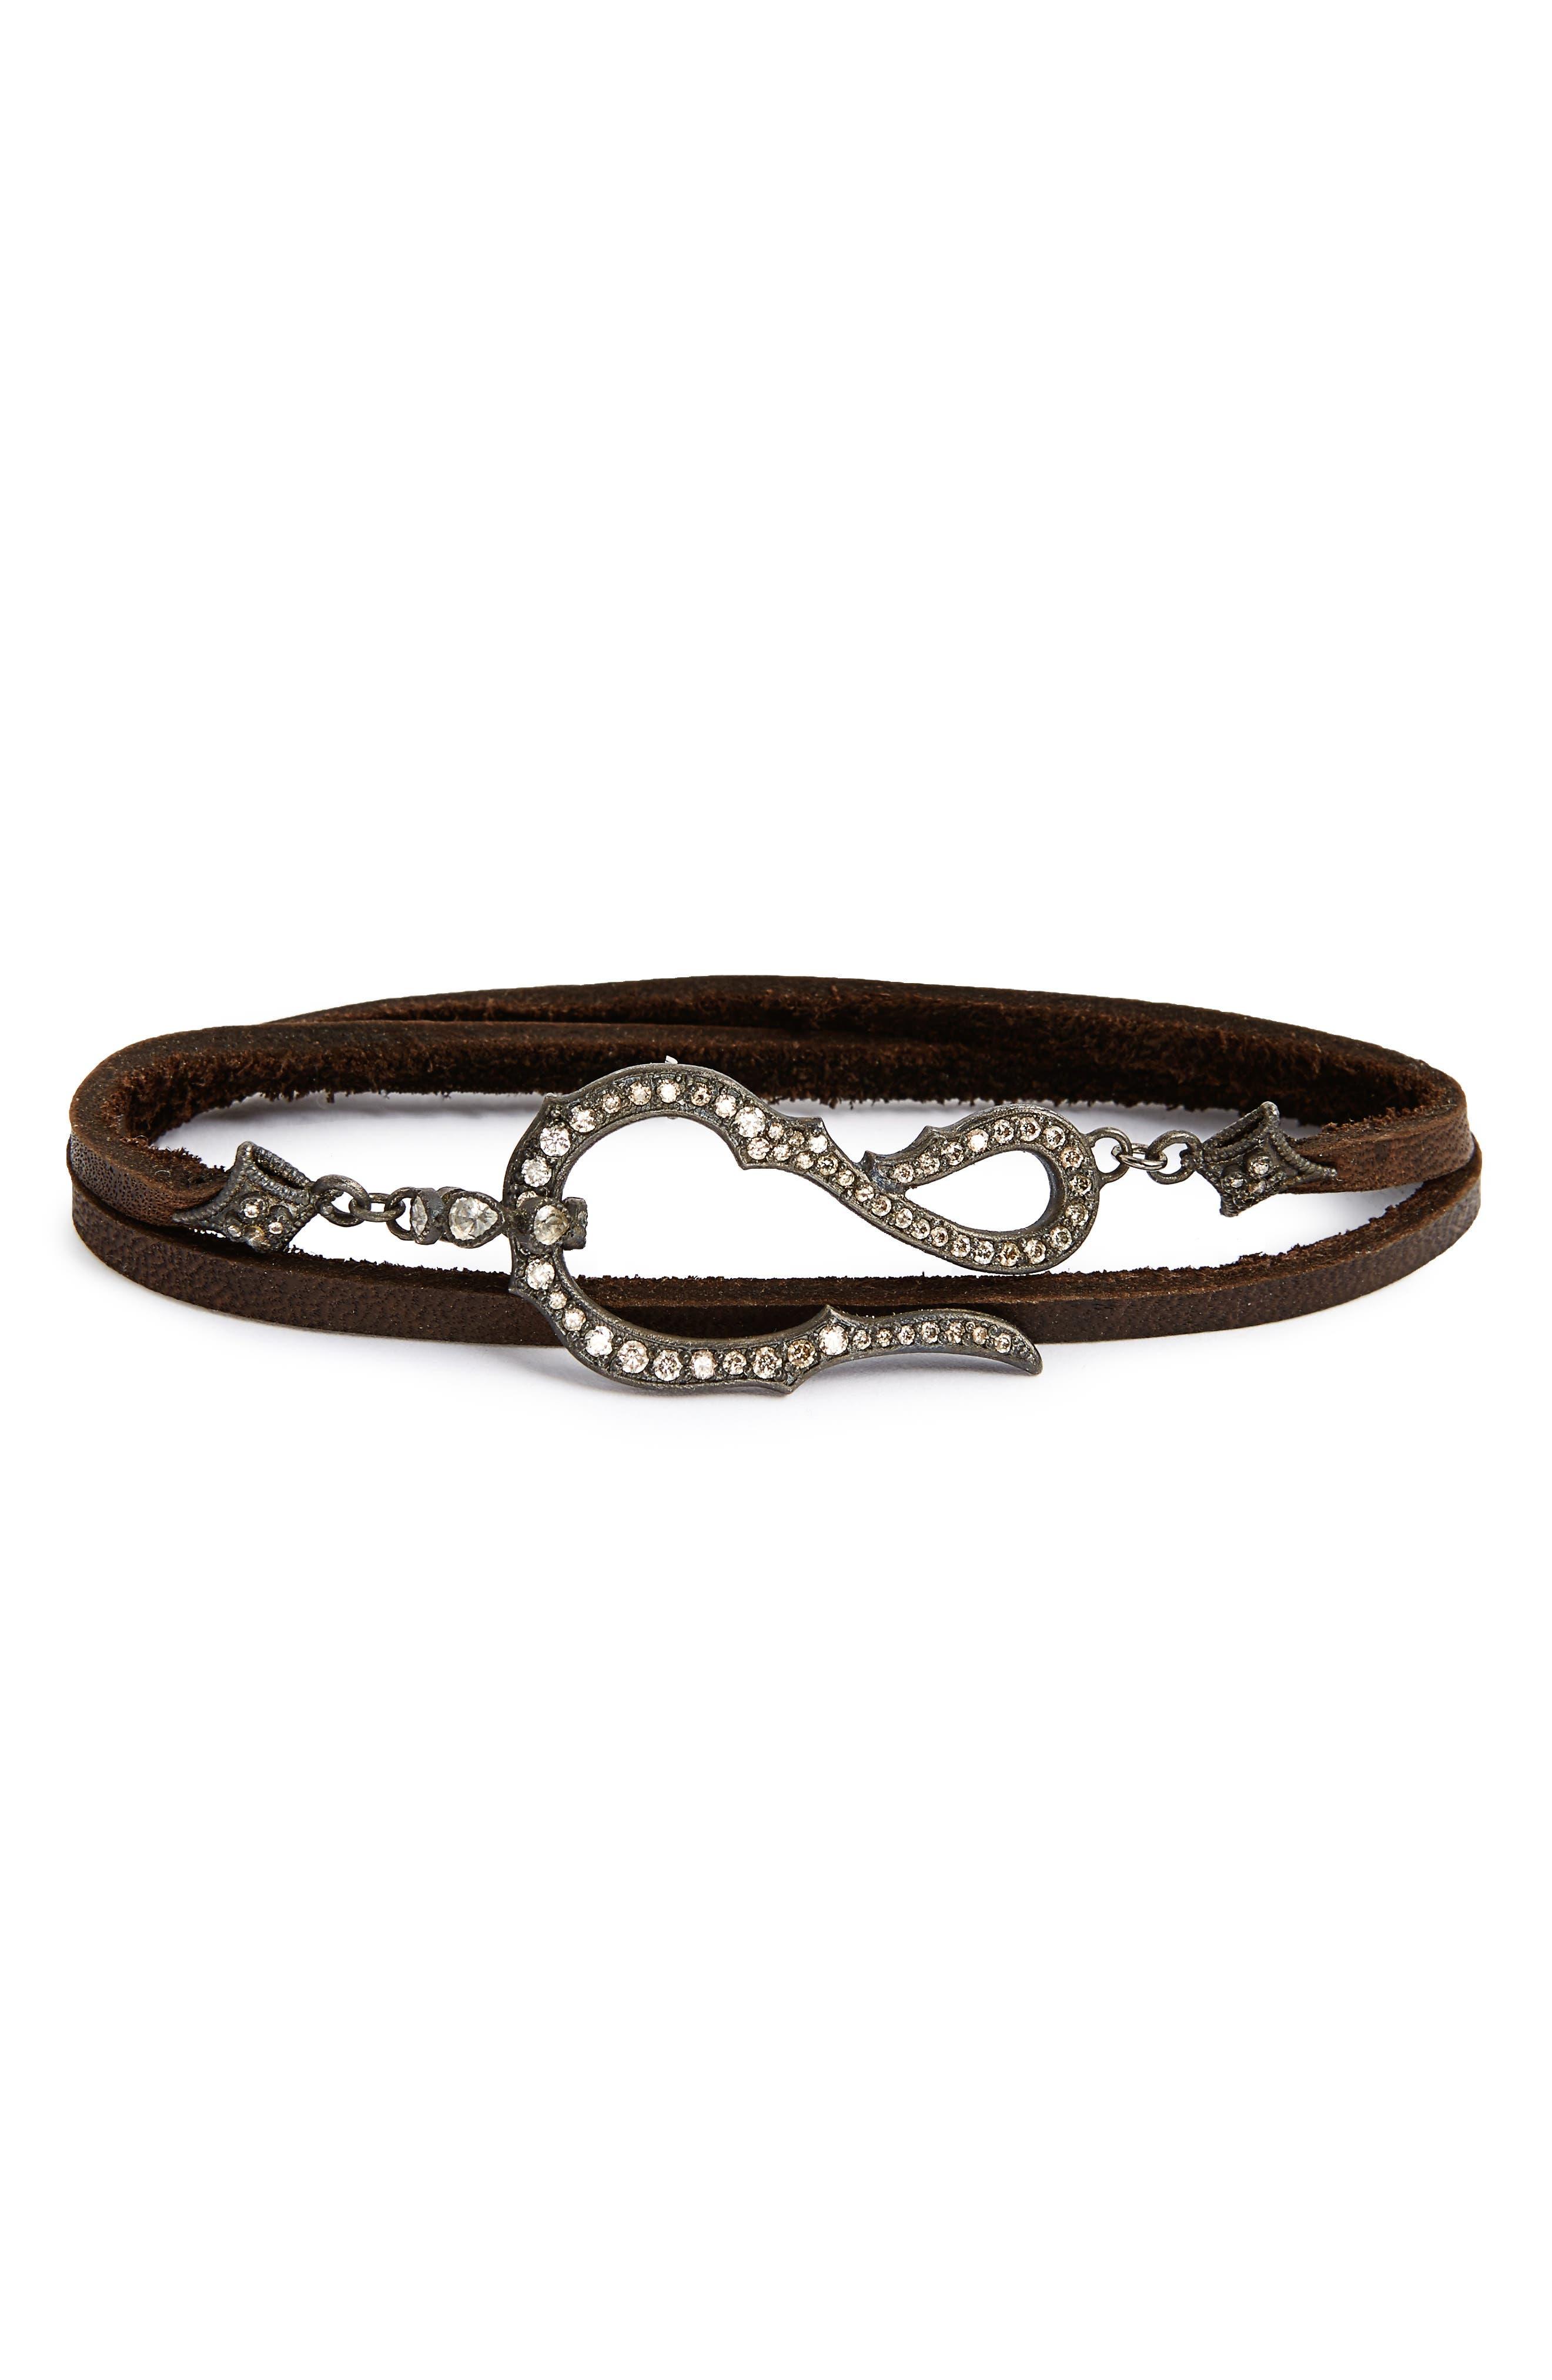 Old World Midnight Leather & Diamond Wrap Bracelet,                         Main,                         color,